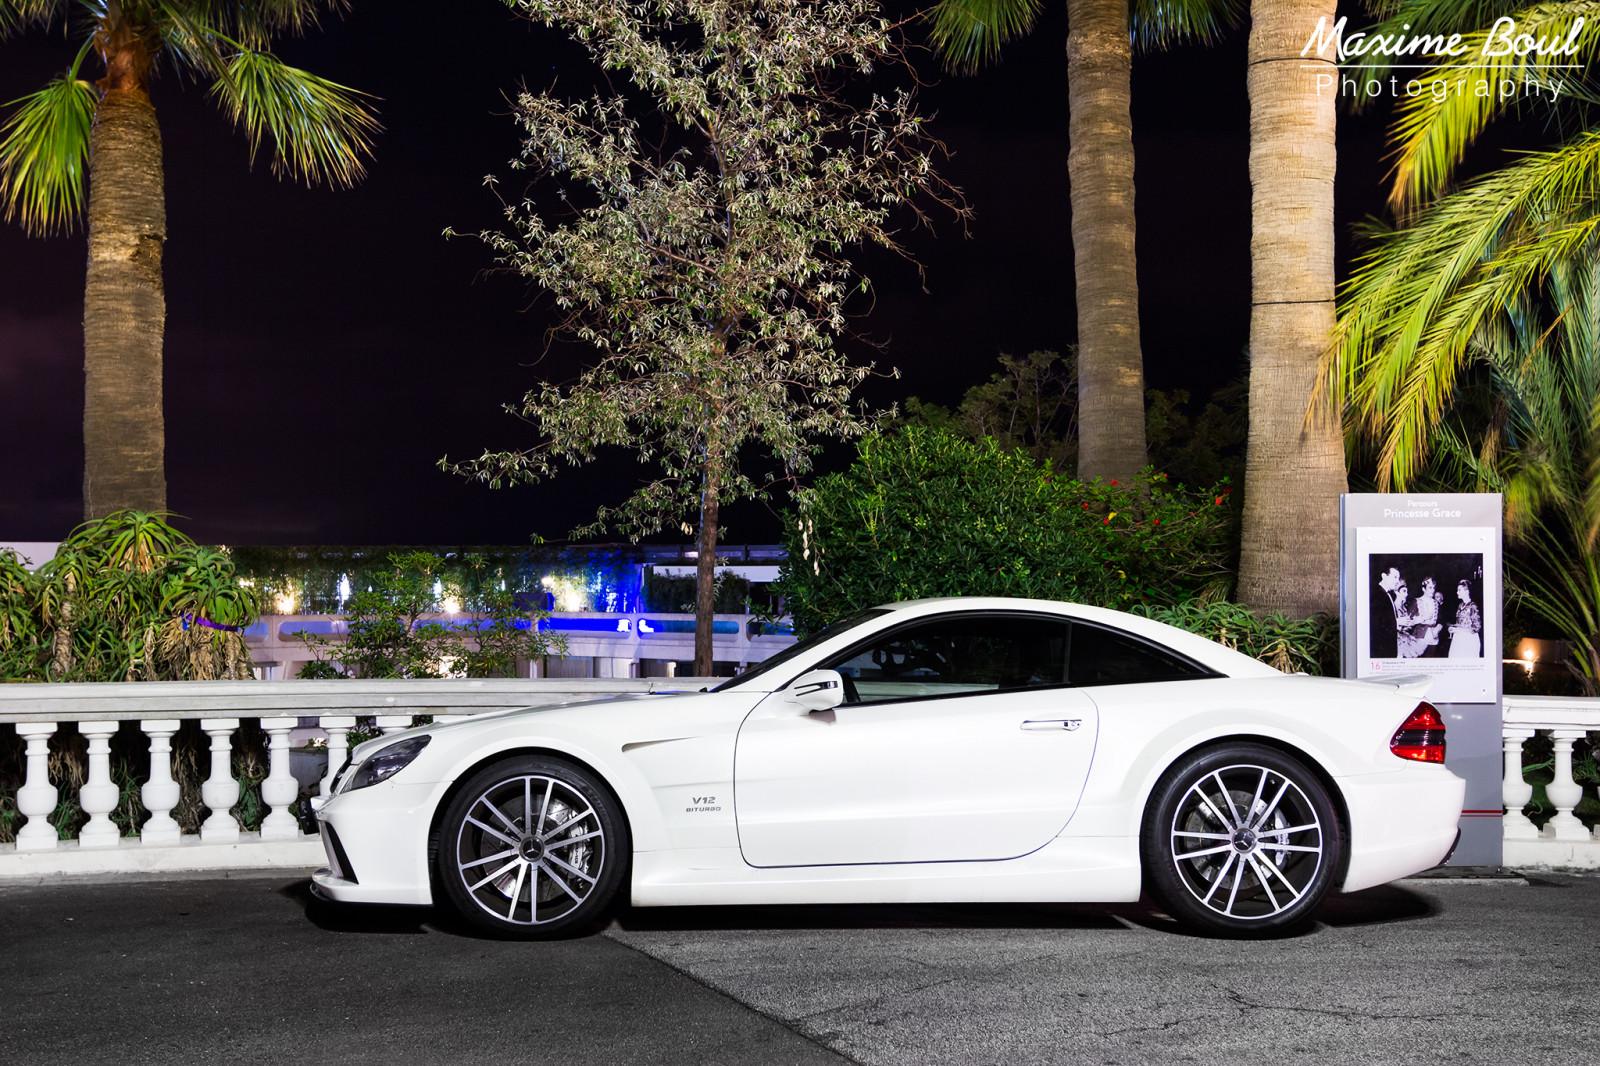 Wallpaper : white, black, street, night, Mercedes Benz ...